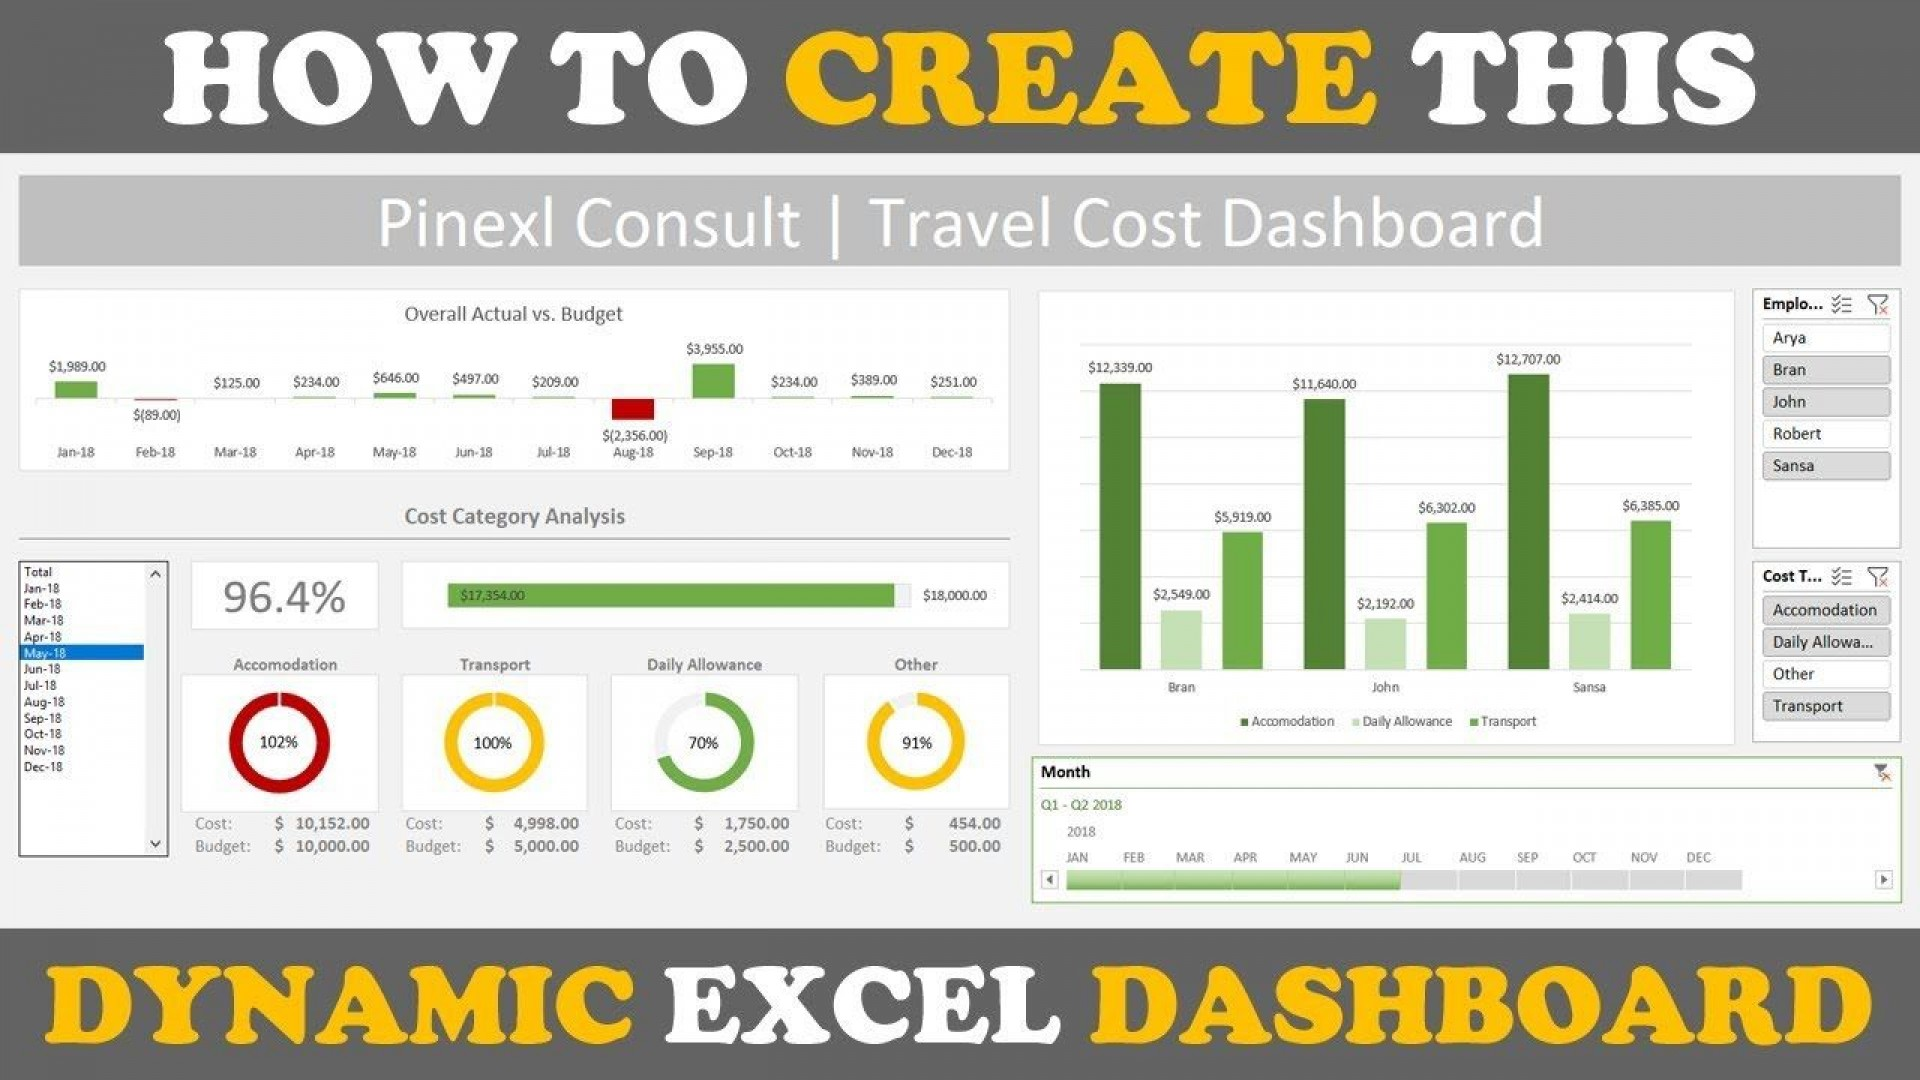 004 Surprising Excel Dashboard Template Free High Definition  Sale Logistic Kpi Download Procurement1920